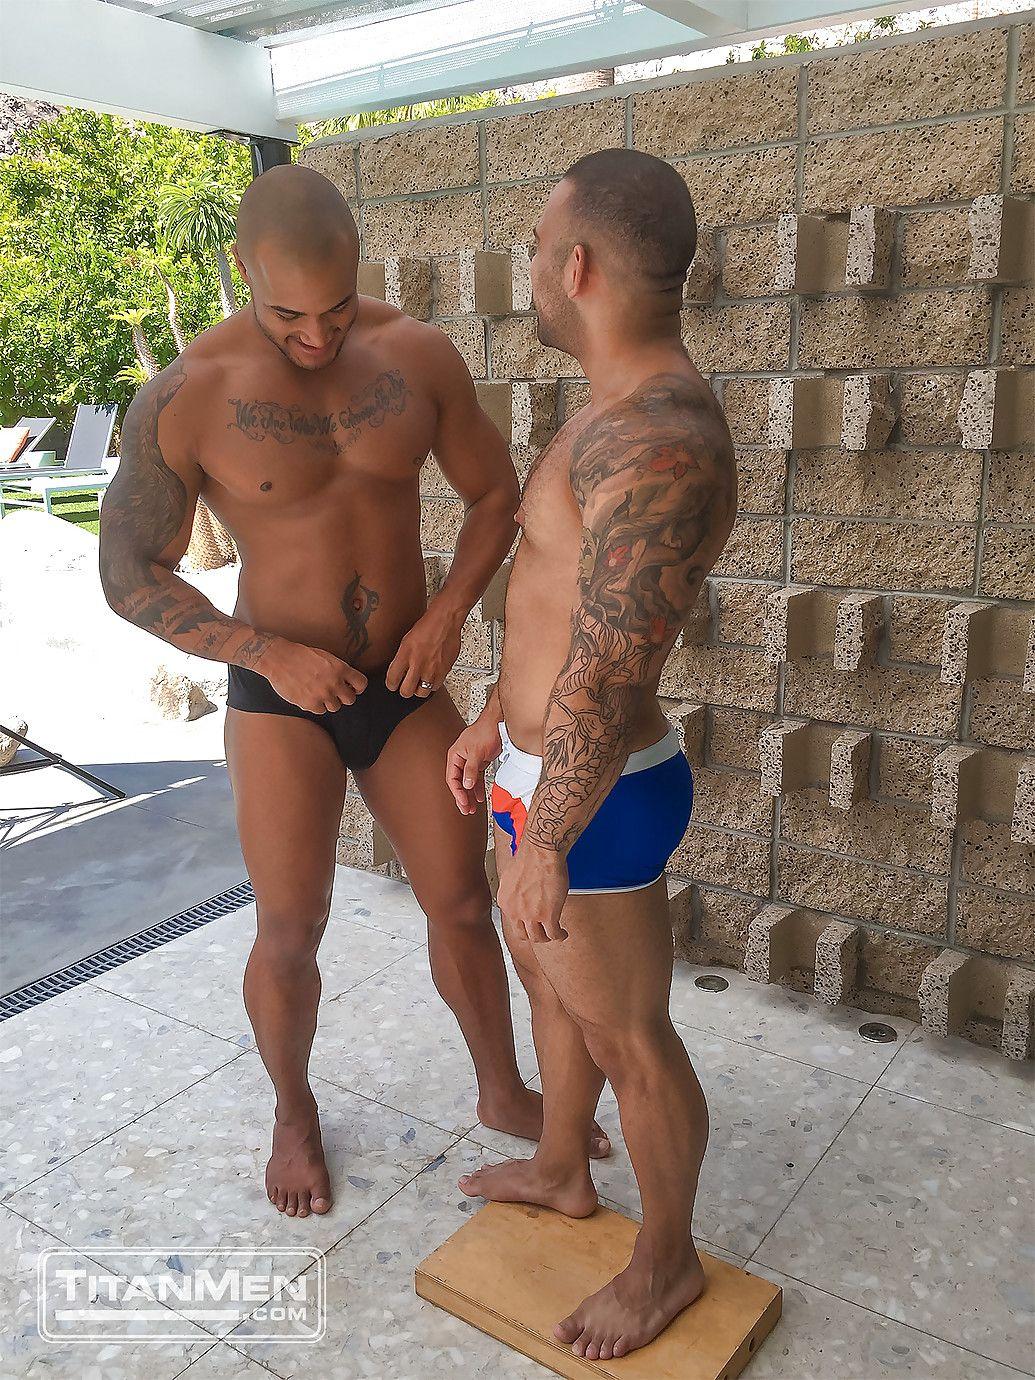 Jason Vario and Lorenzo Flexx